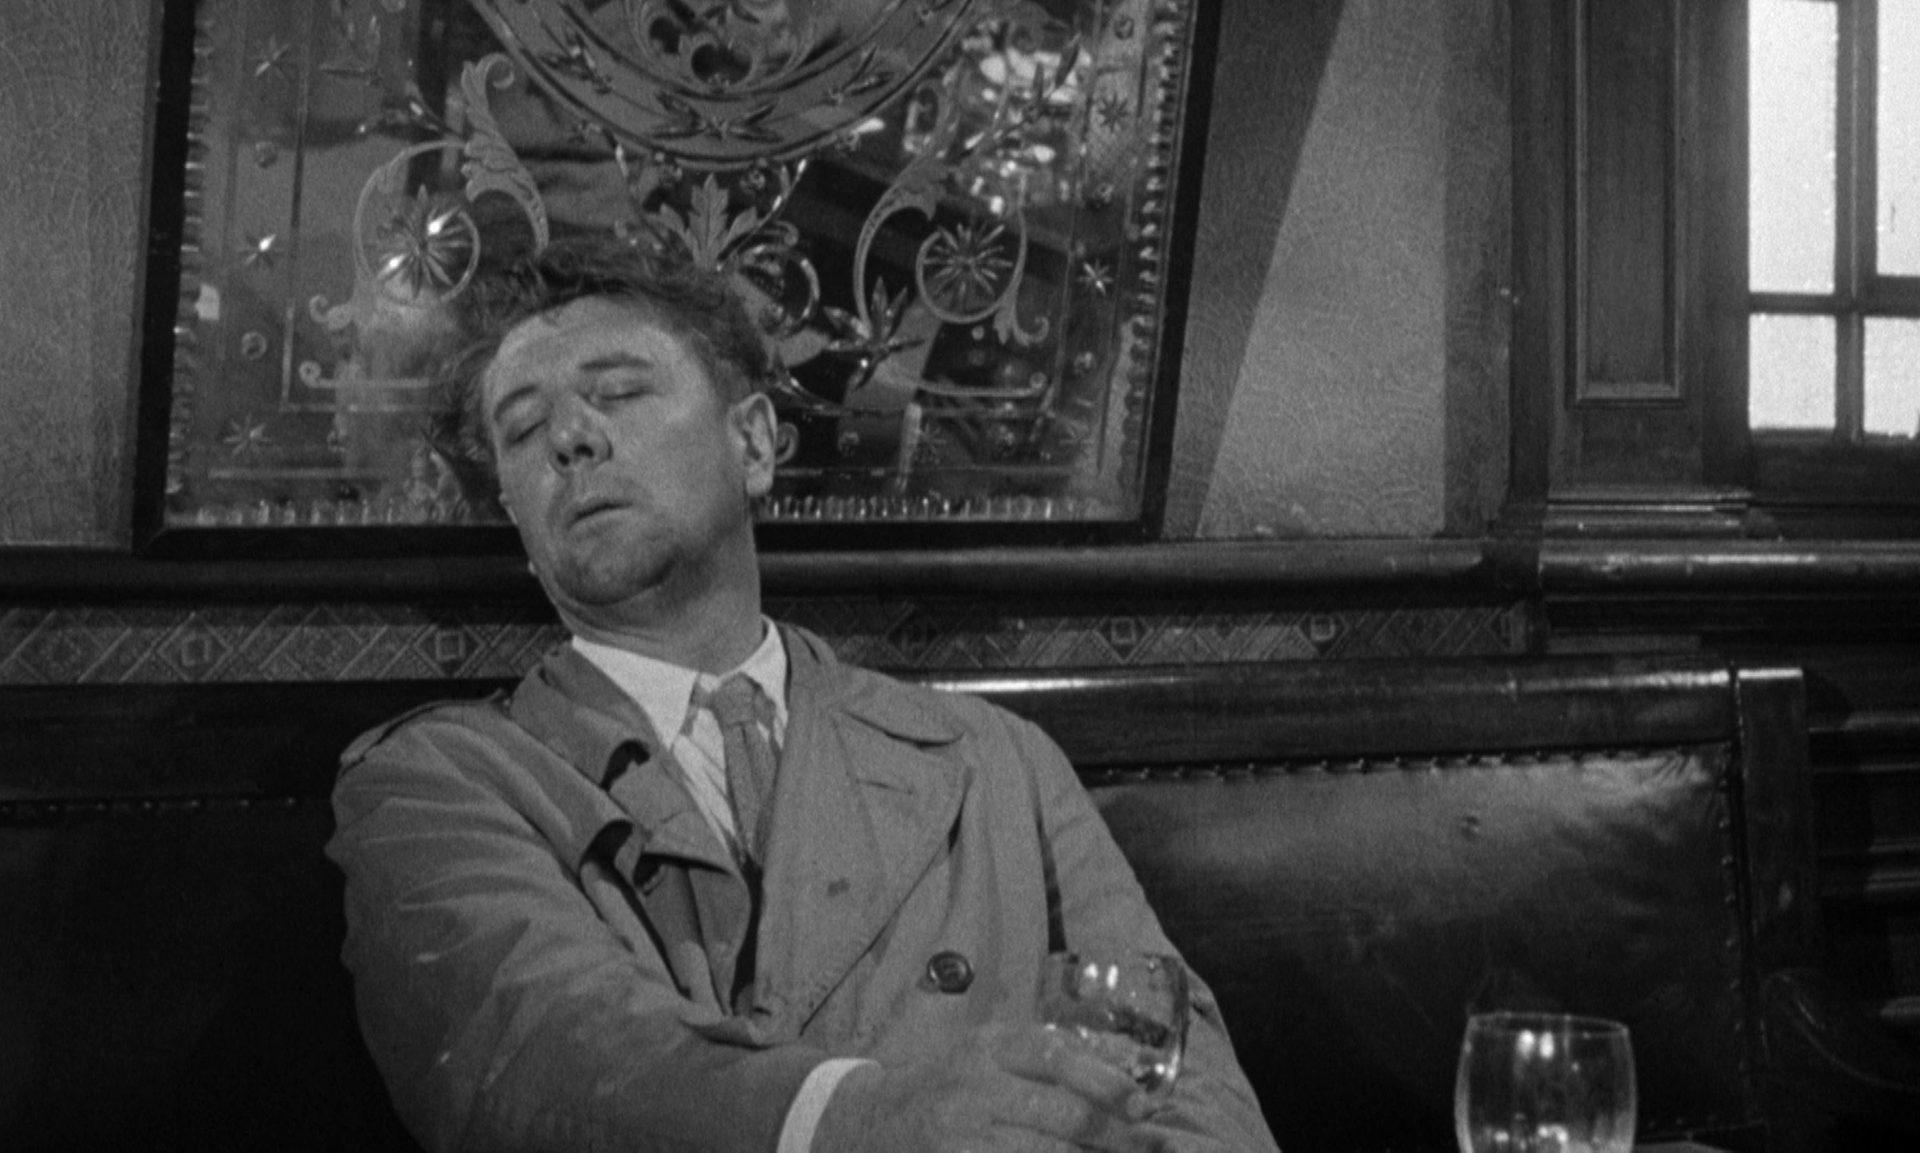 Szene aus 'Teuflisches Alibi(1957)', Copyright: Harlequin Productions